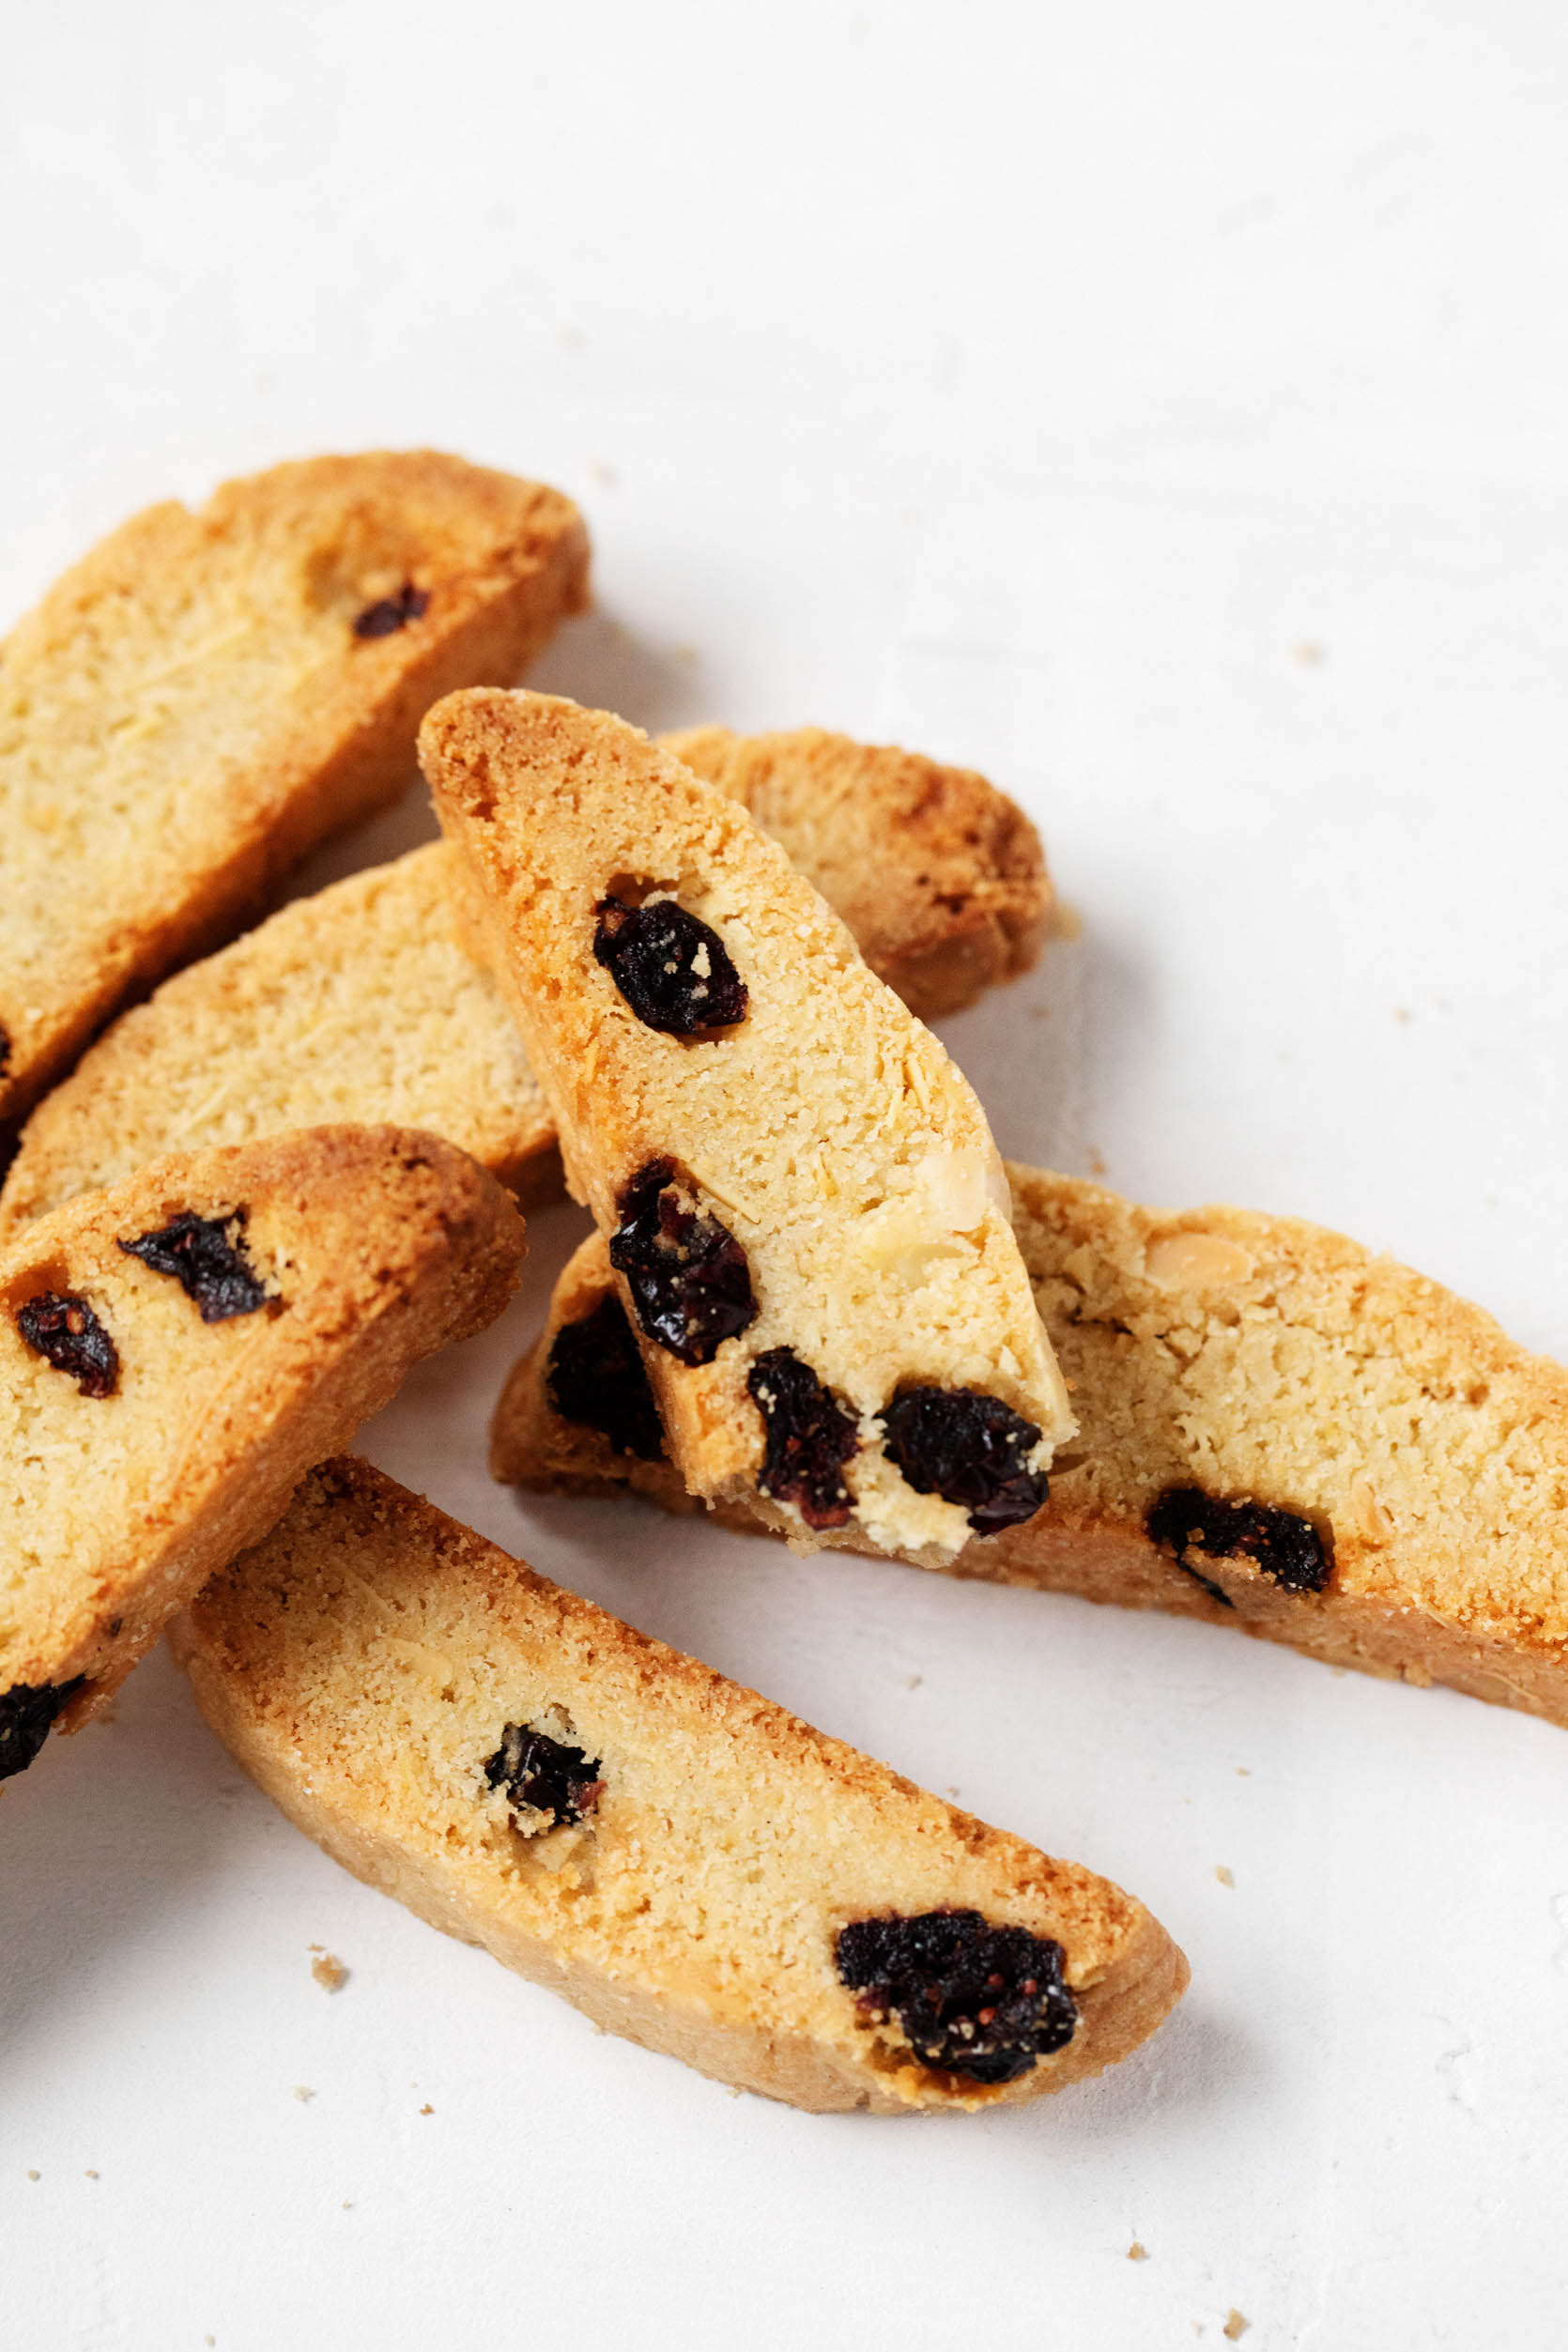 Vegan Cranberry Almond Biscotti | The Full Helping